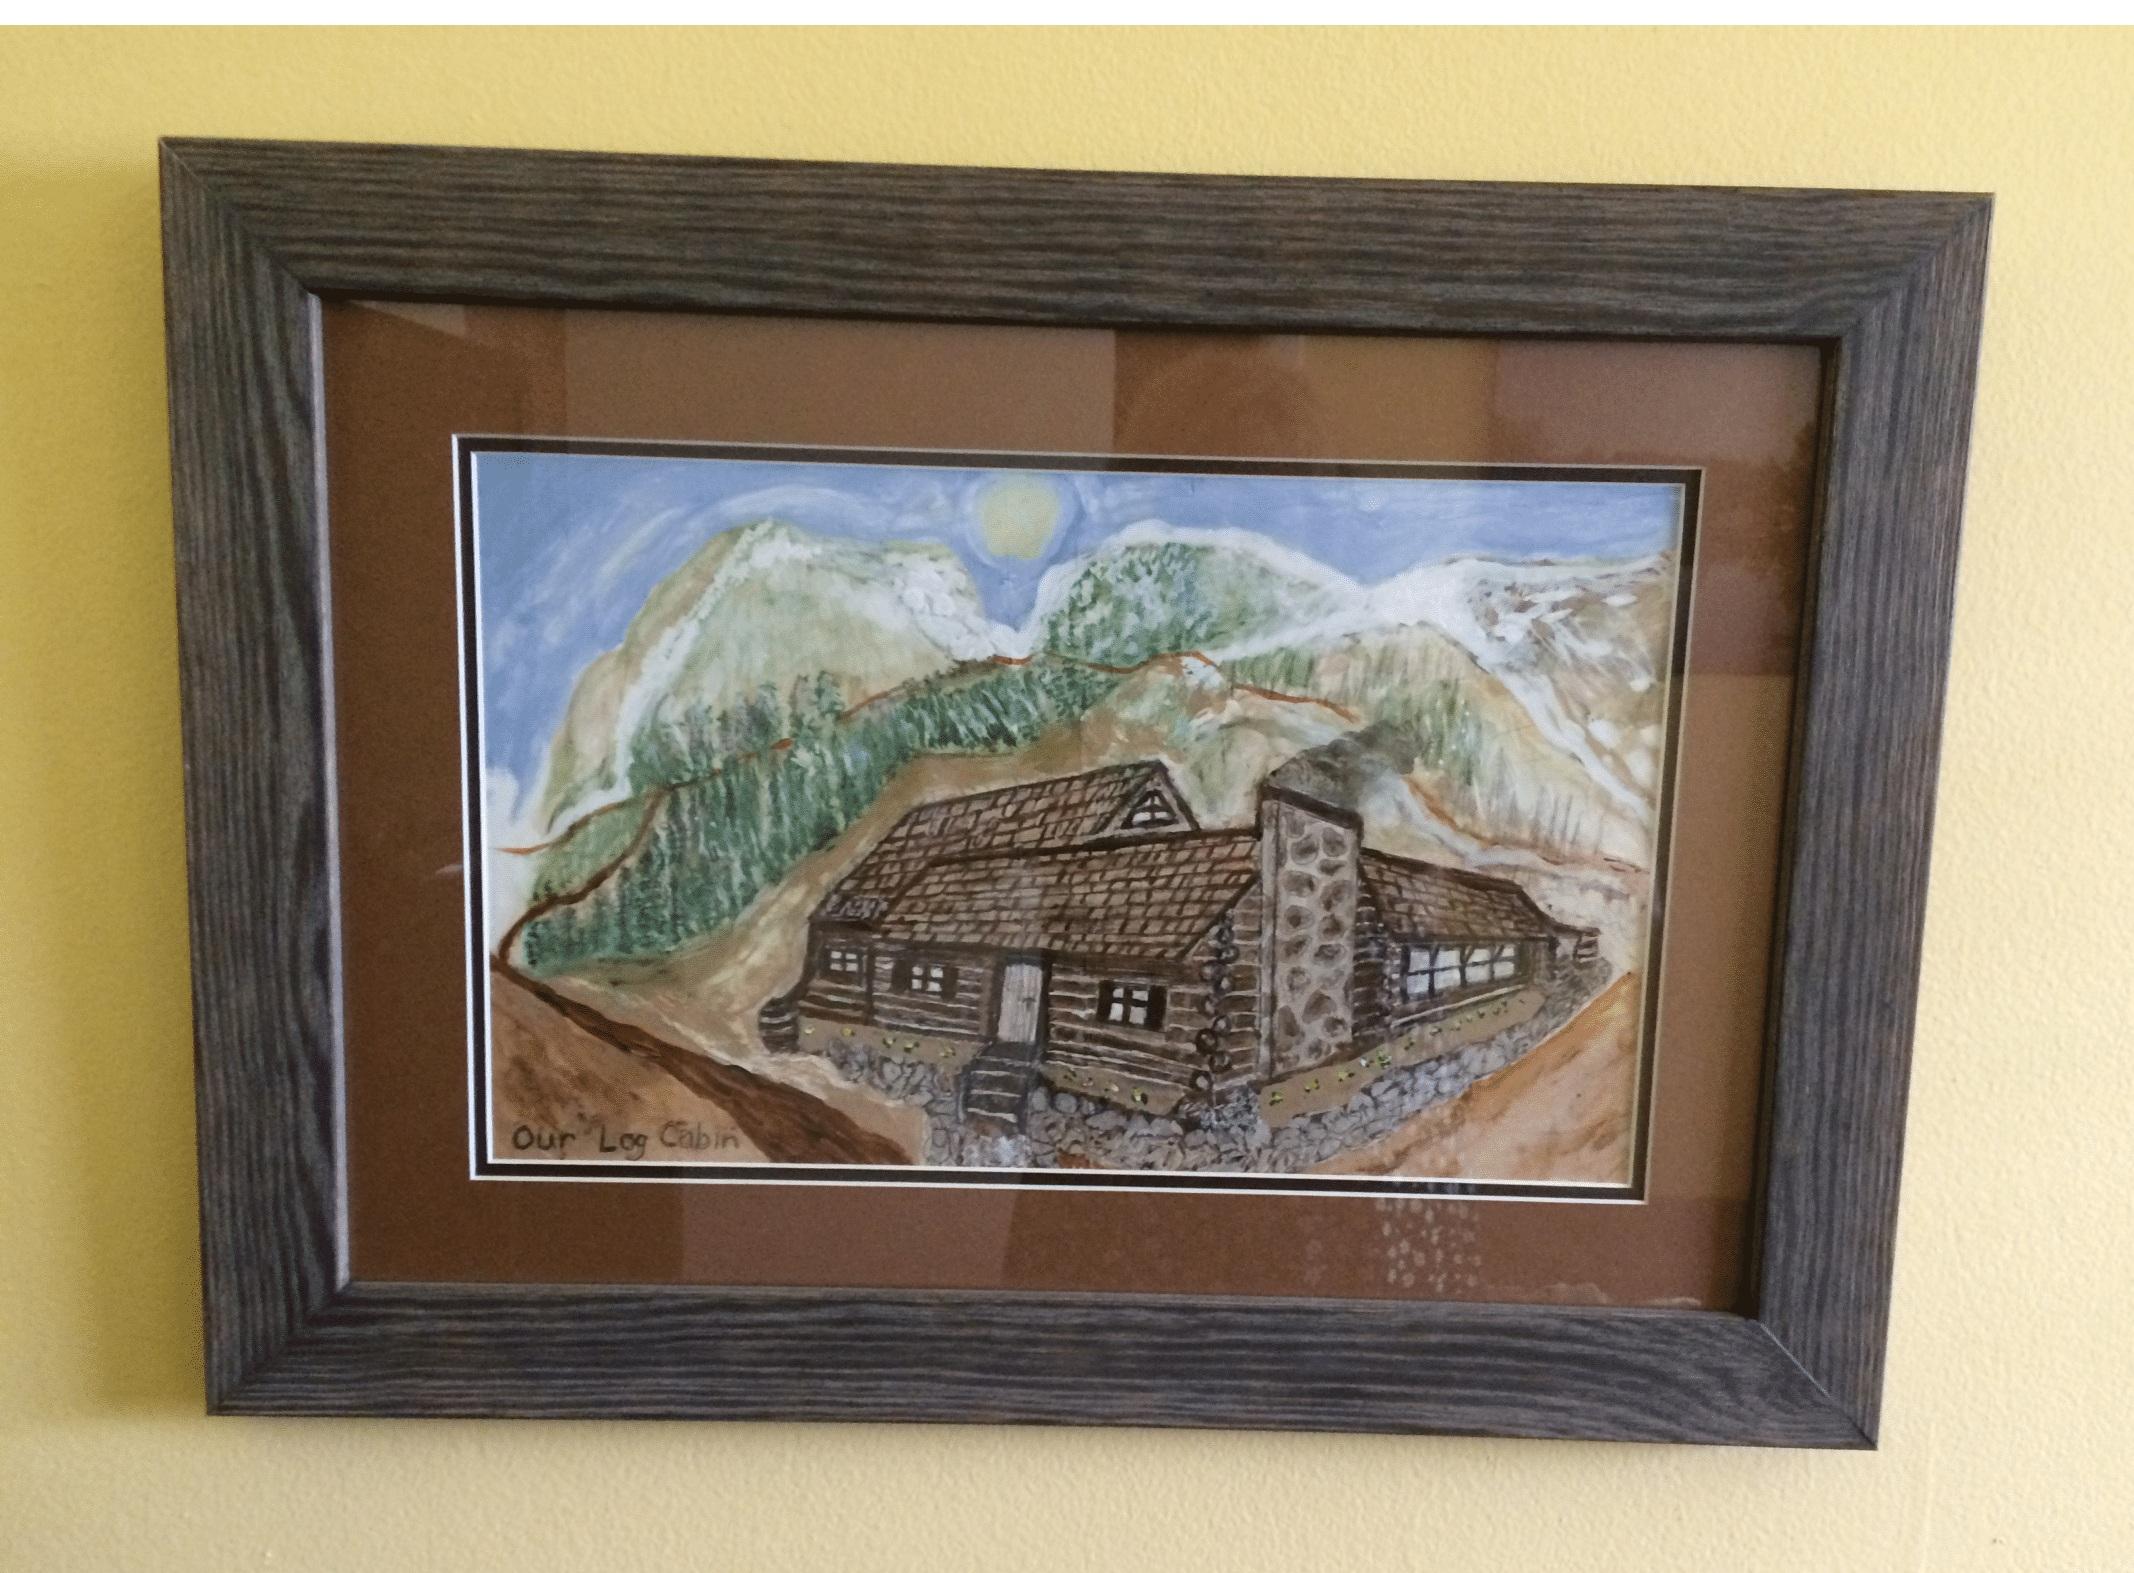 'Dream Rocky Mountain Log Cabin' in acrylic